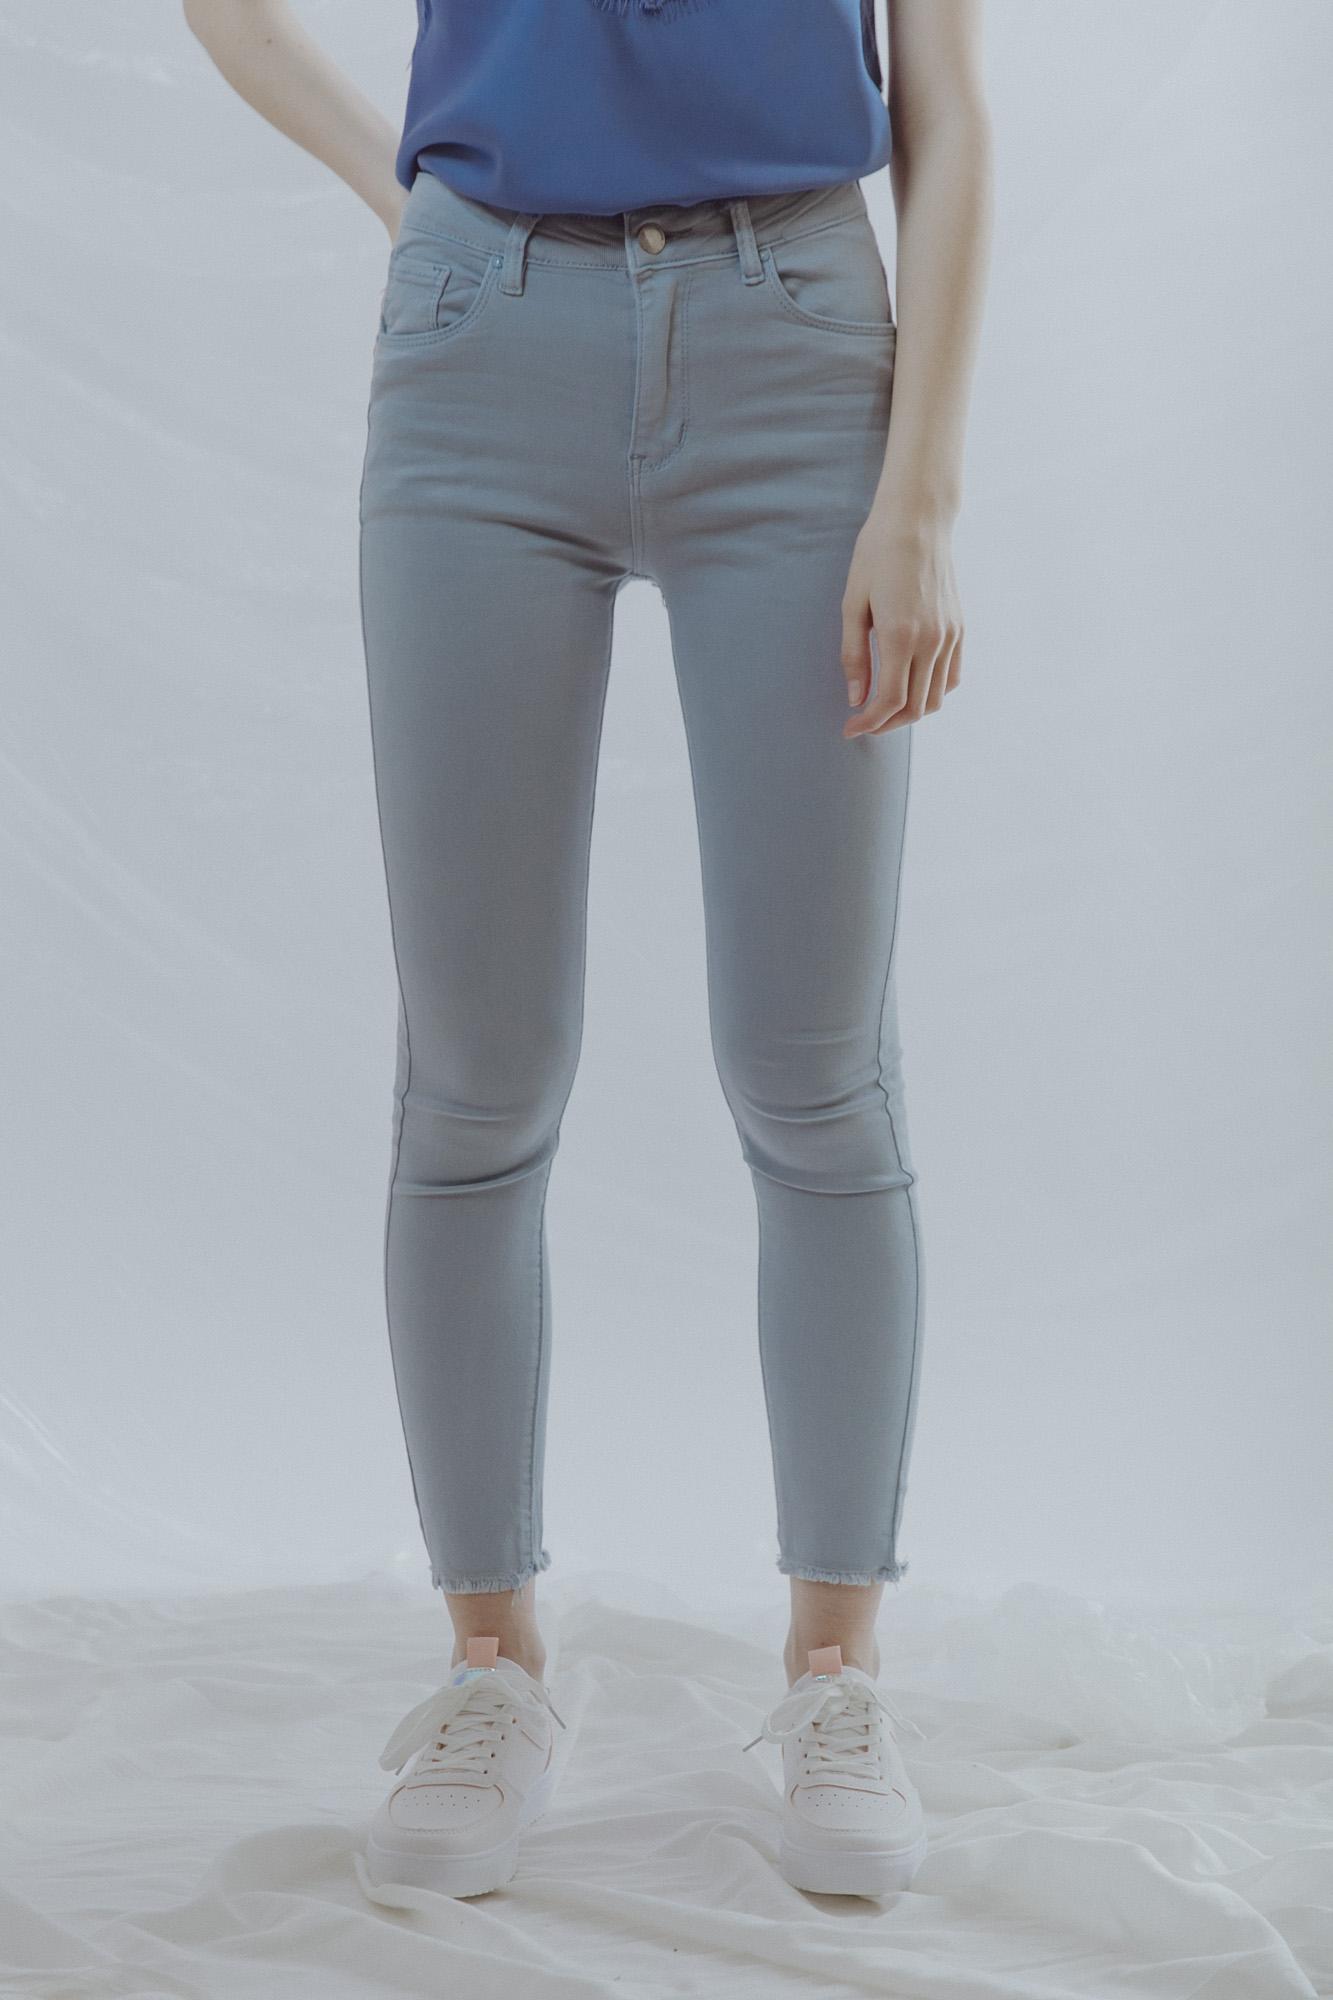 Kate Sky Skinny Jeans